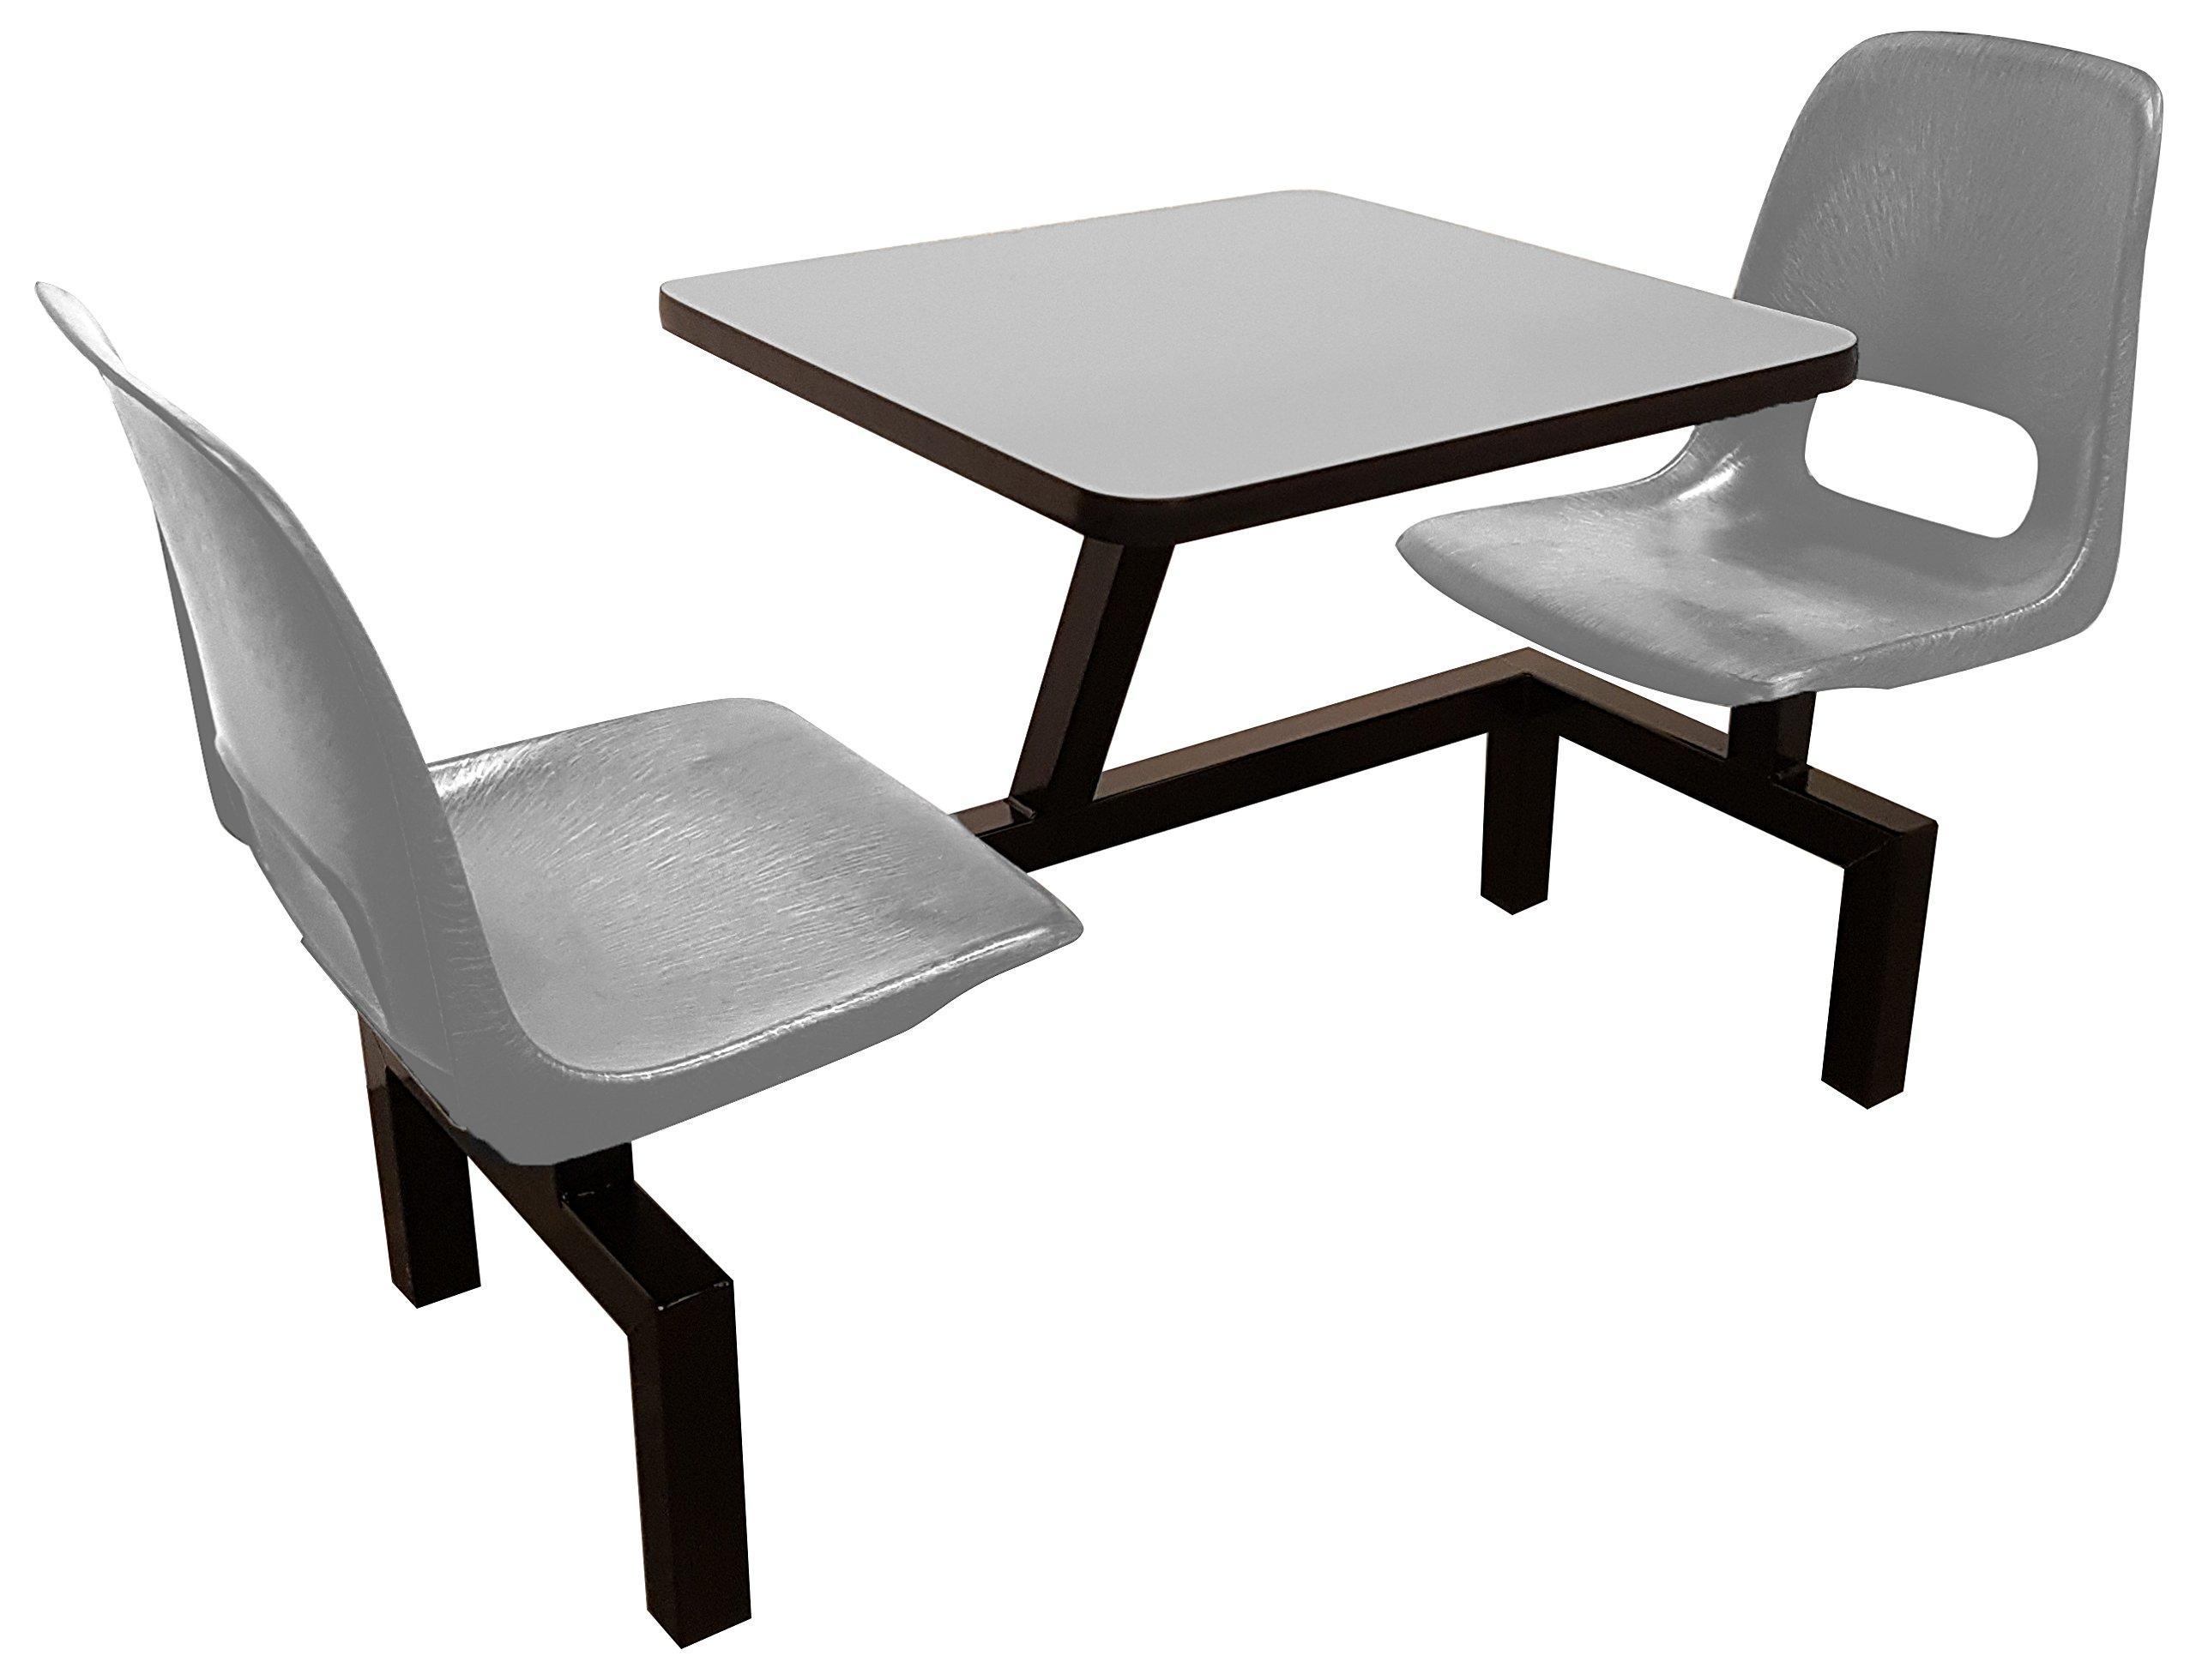 Rodo Industries 12STW-NB-GR 12STW,NB,GR Series 1 Public Cluster Modular Seating, Two Seat Wall Units, Grey Seat, Grey Tabletop, 60'' x 24'' x 29''